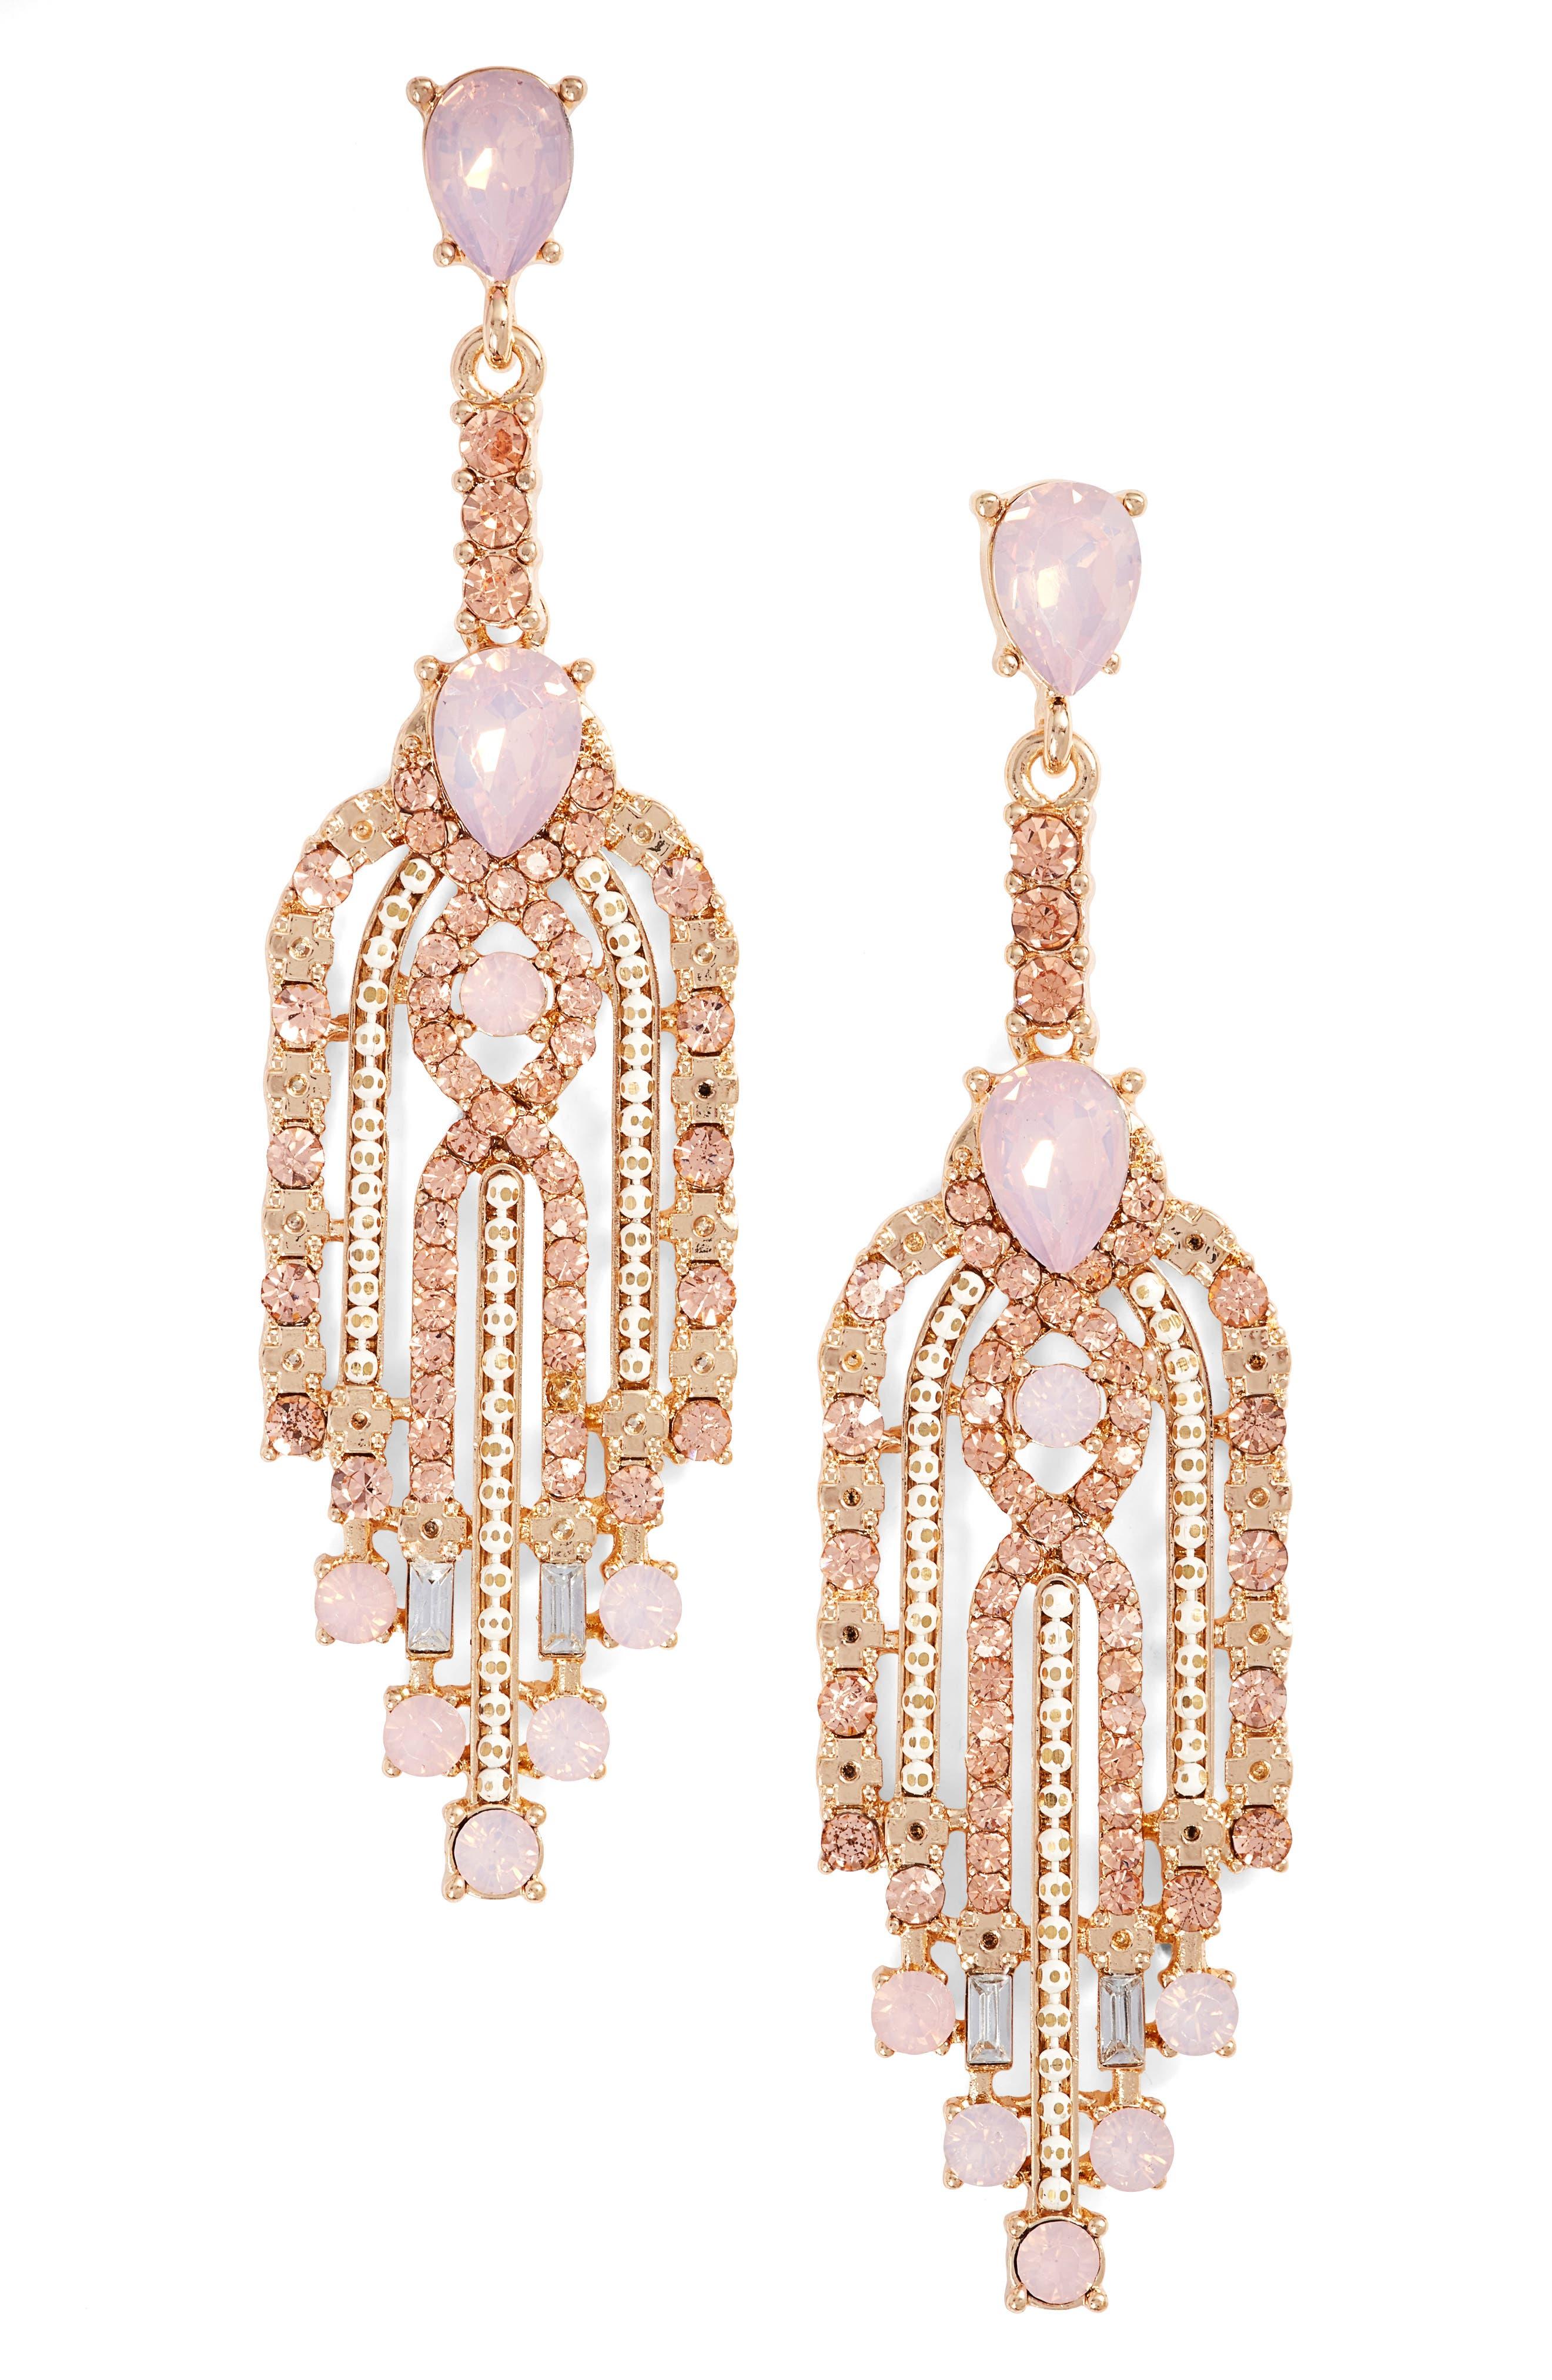 Crystal Drop Earrings,                             Main thumbnail 1, color,                             650